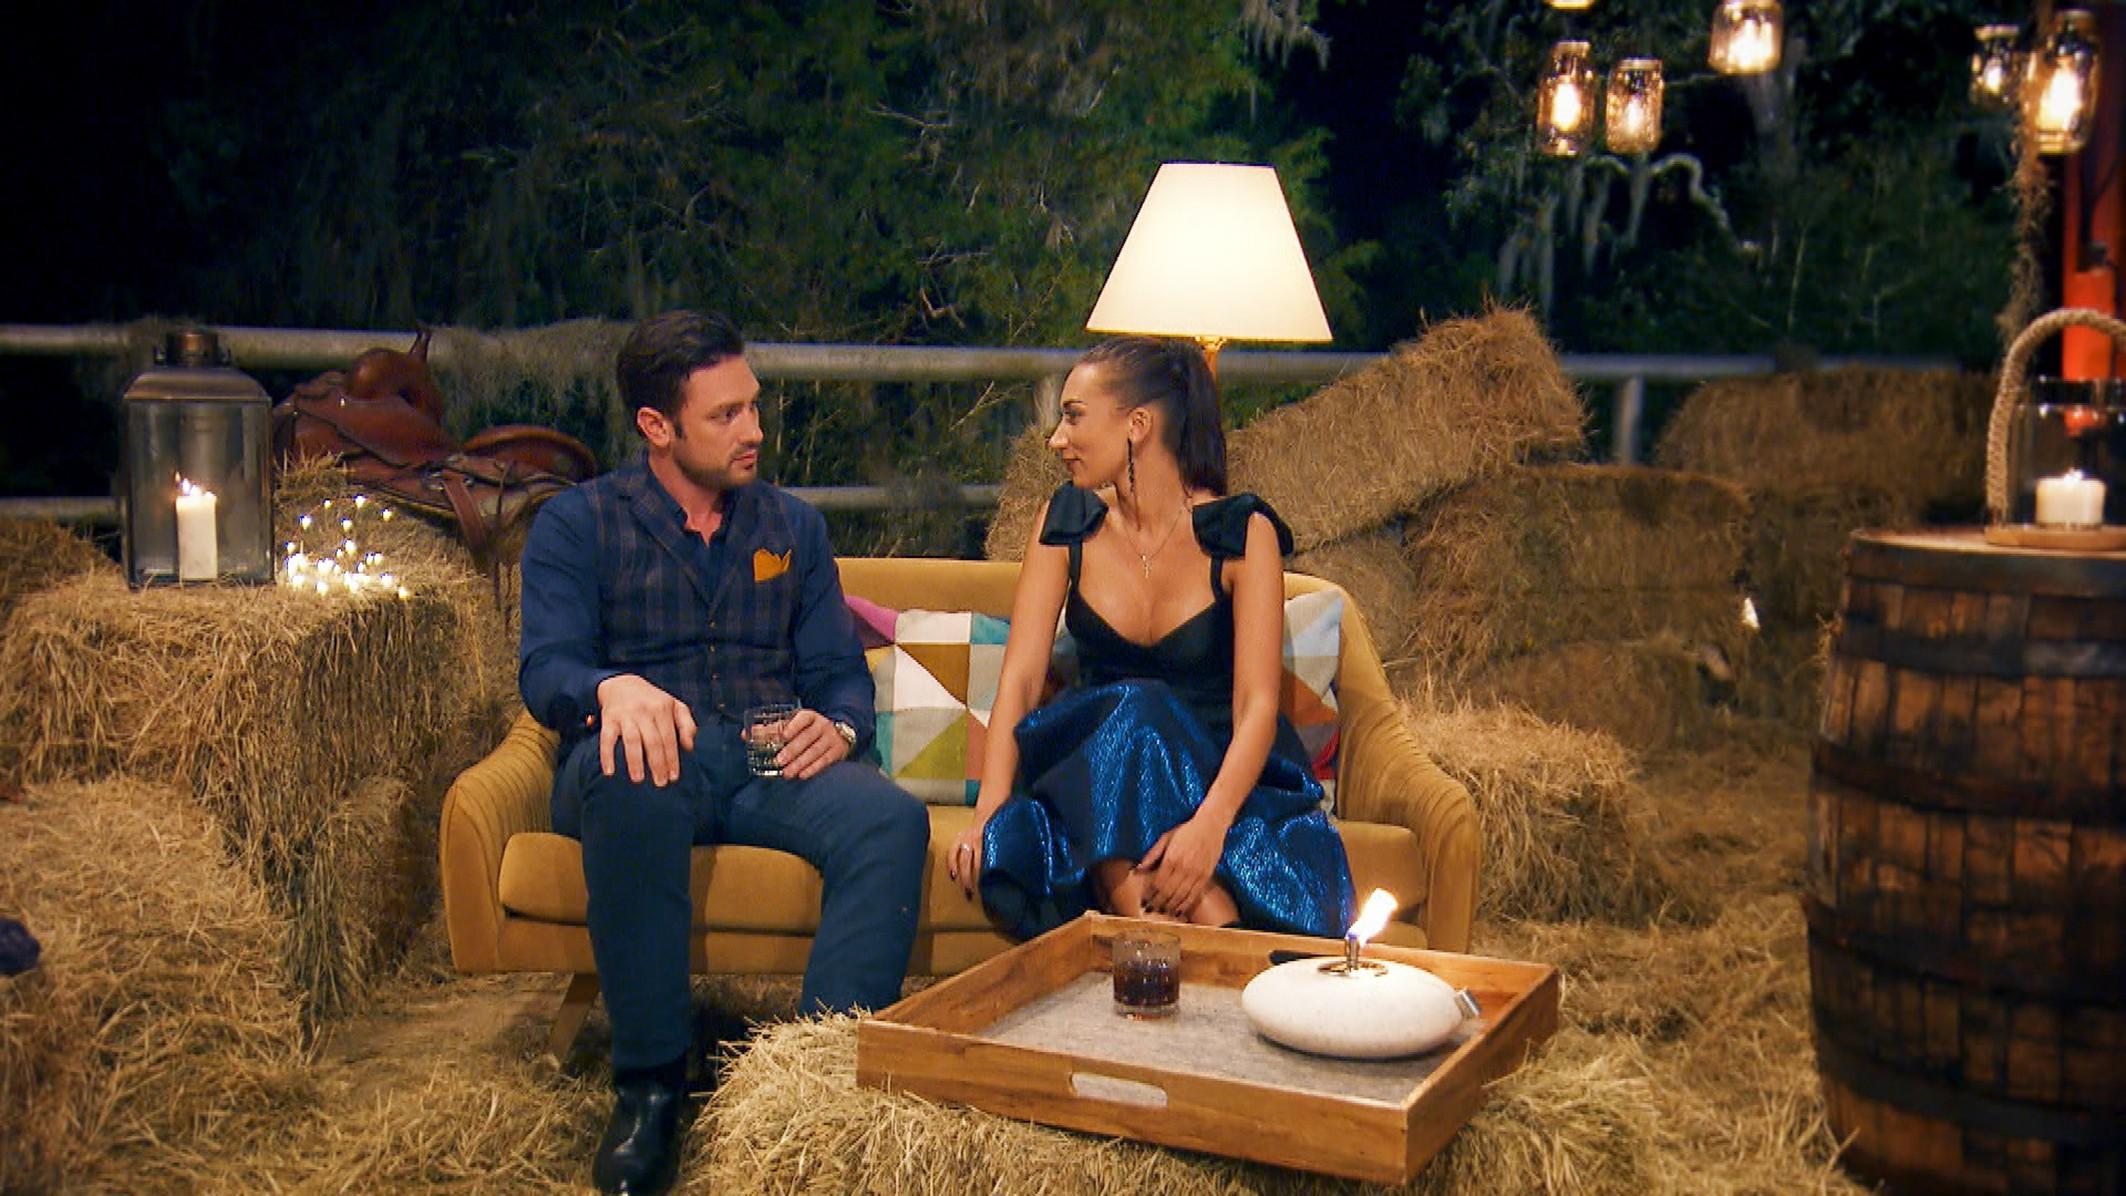 Der Bachelor 2018 Folge 6 - Daniel und Samira